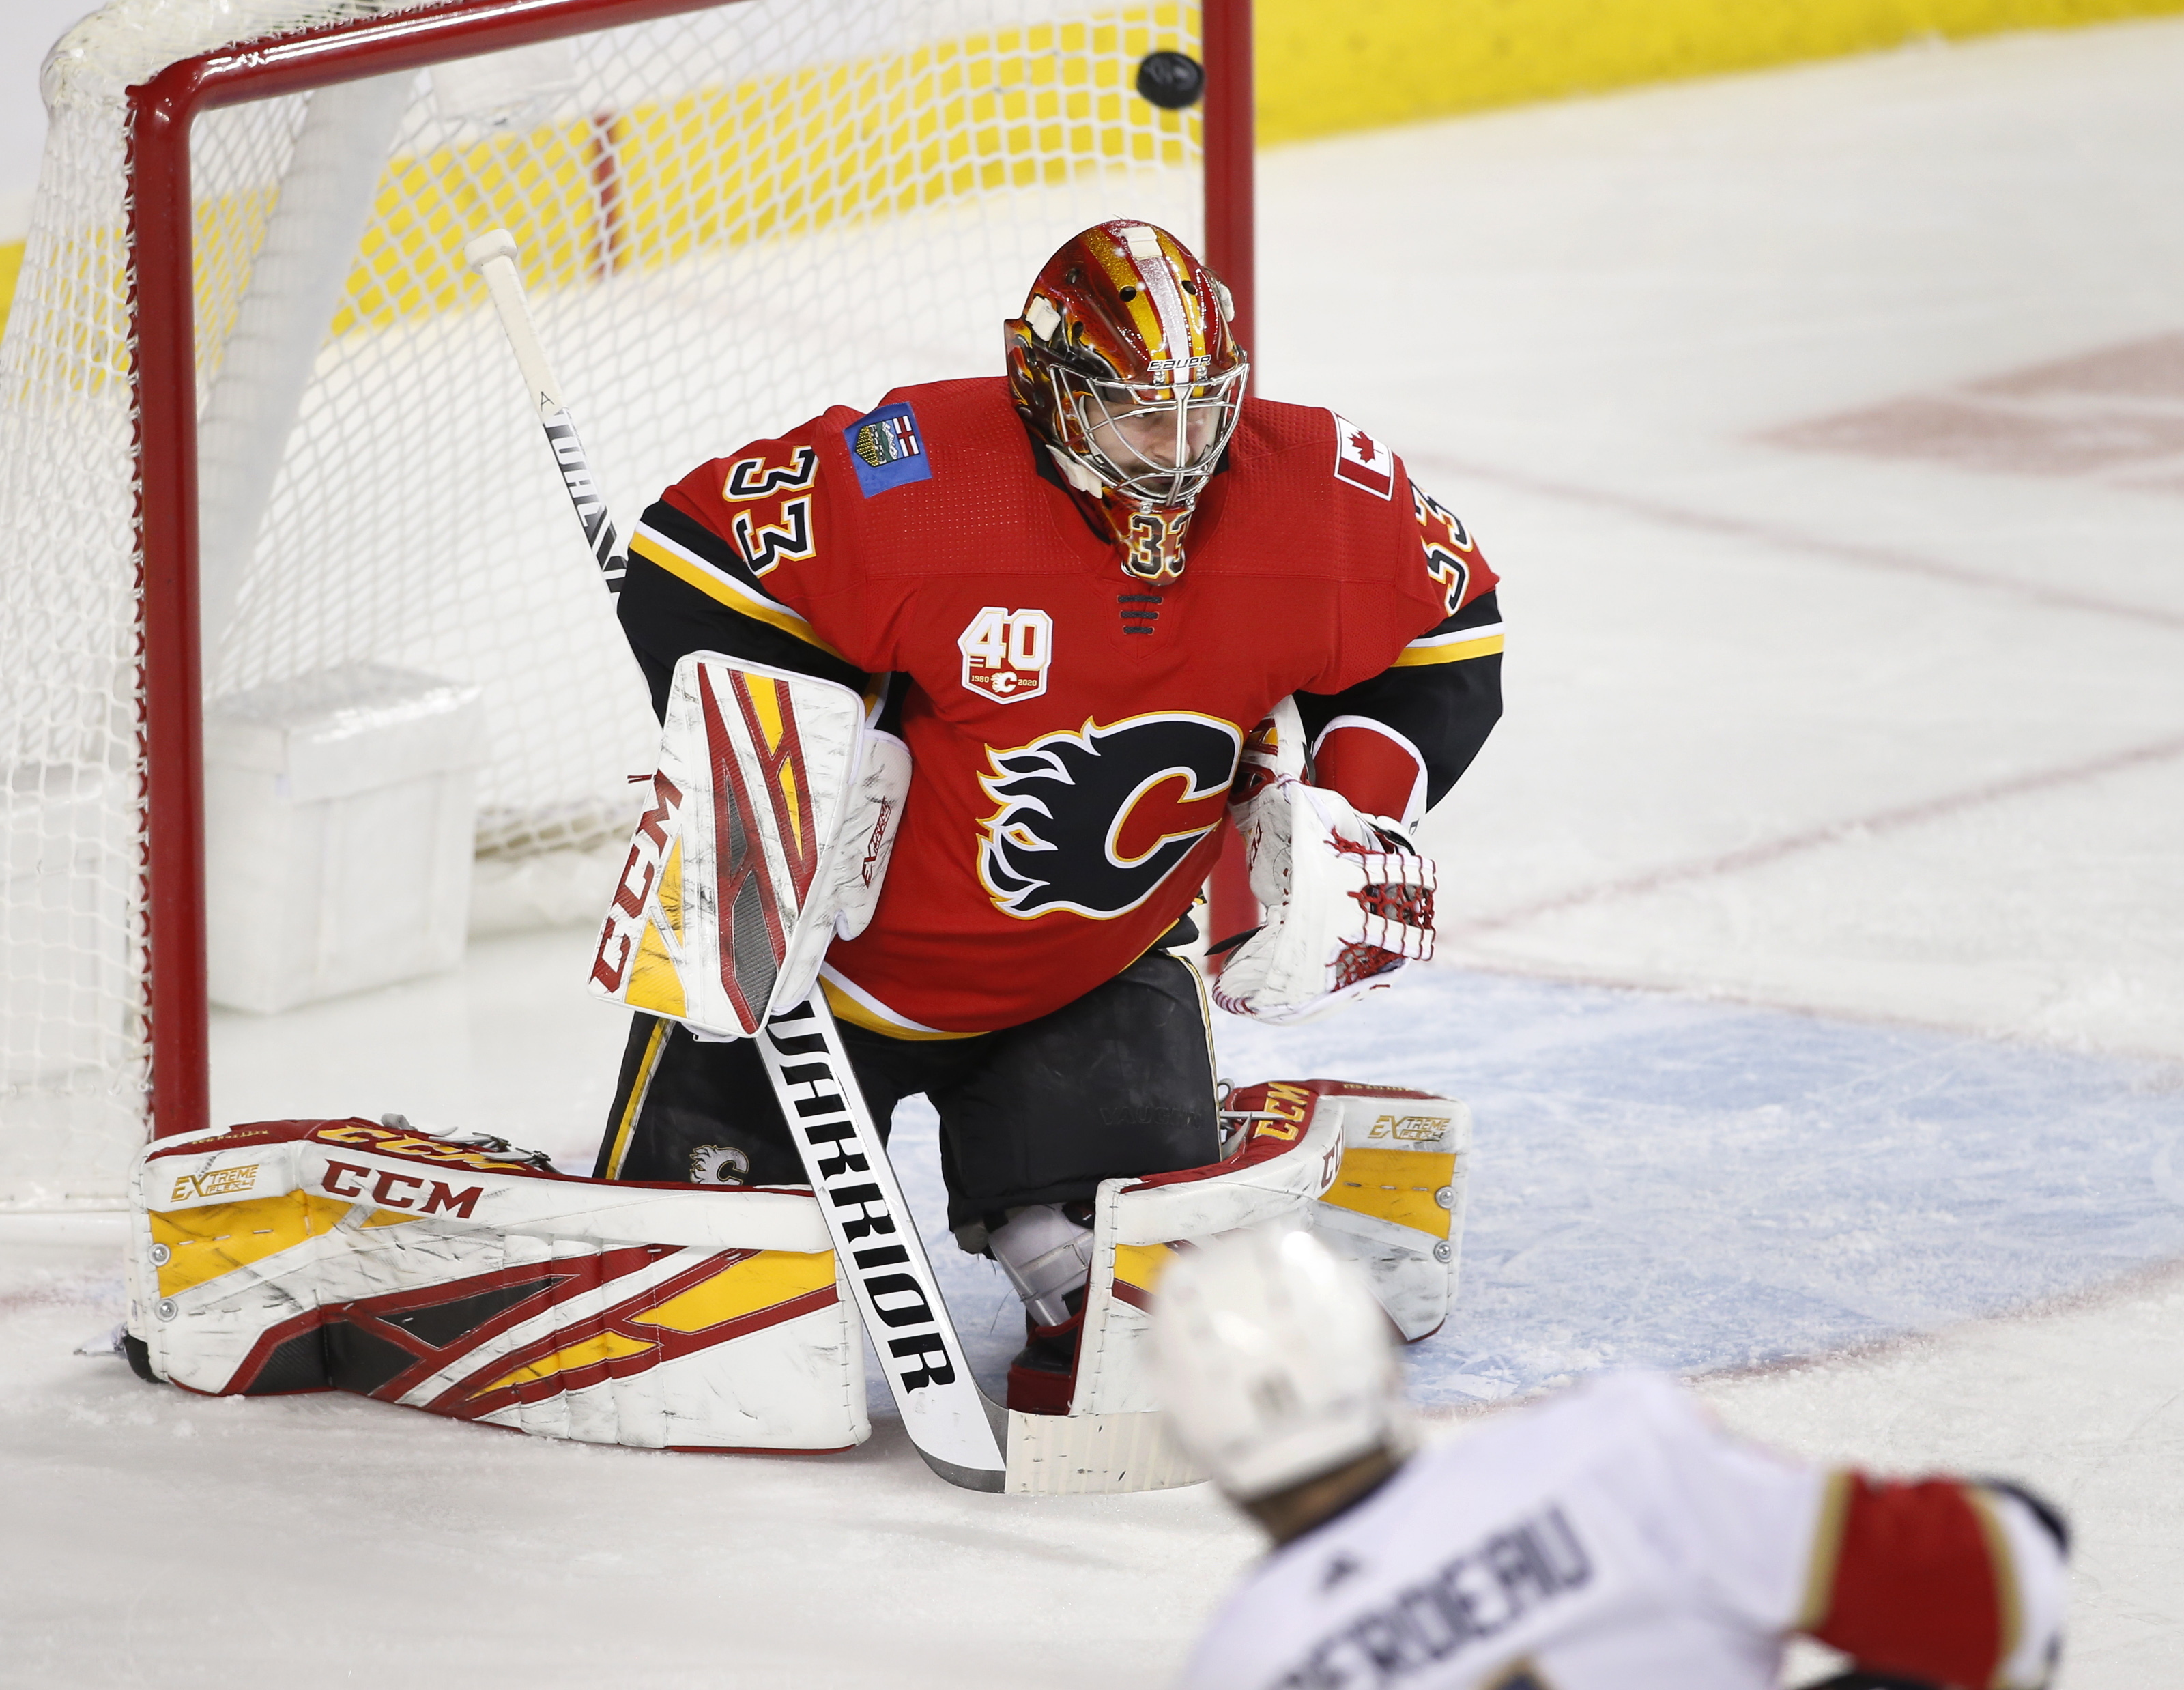 Matthew Tkachuk leads Flames past Panthers 6-5 in shootout